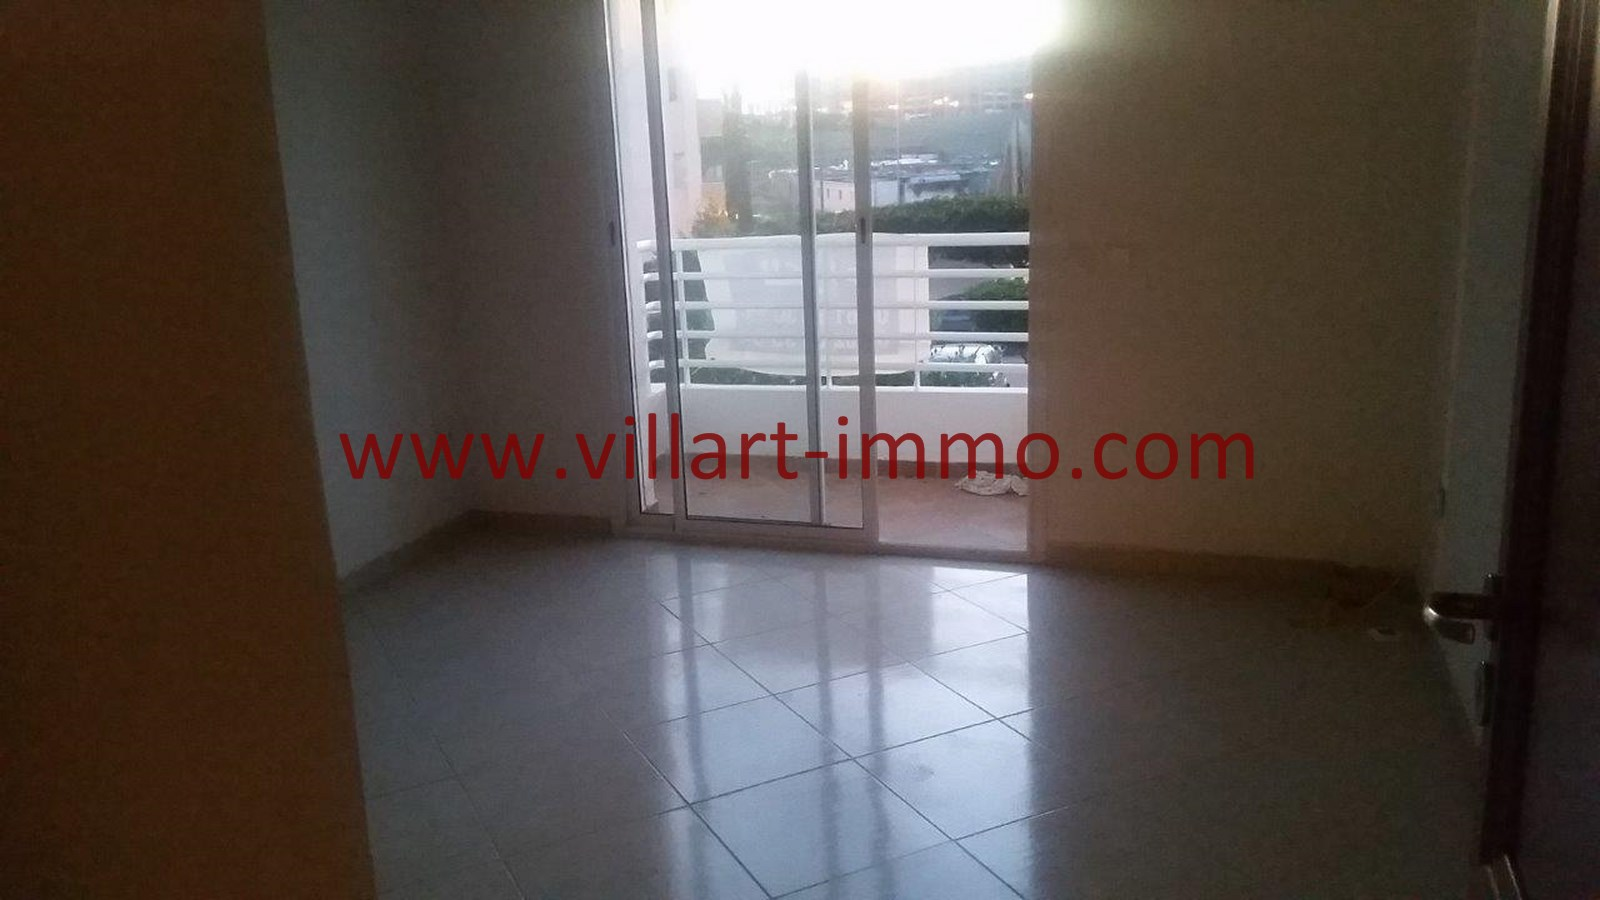 5-Location-Appartement-Non meublé-Tanger-Chambre 2-L913-Villart immo